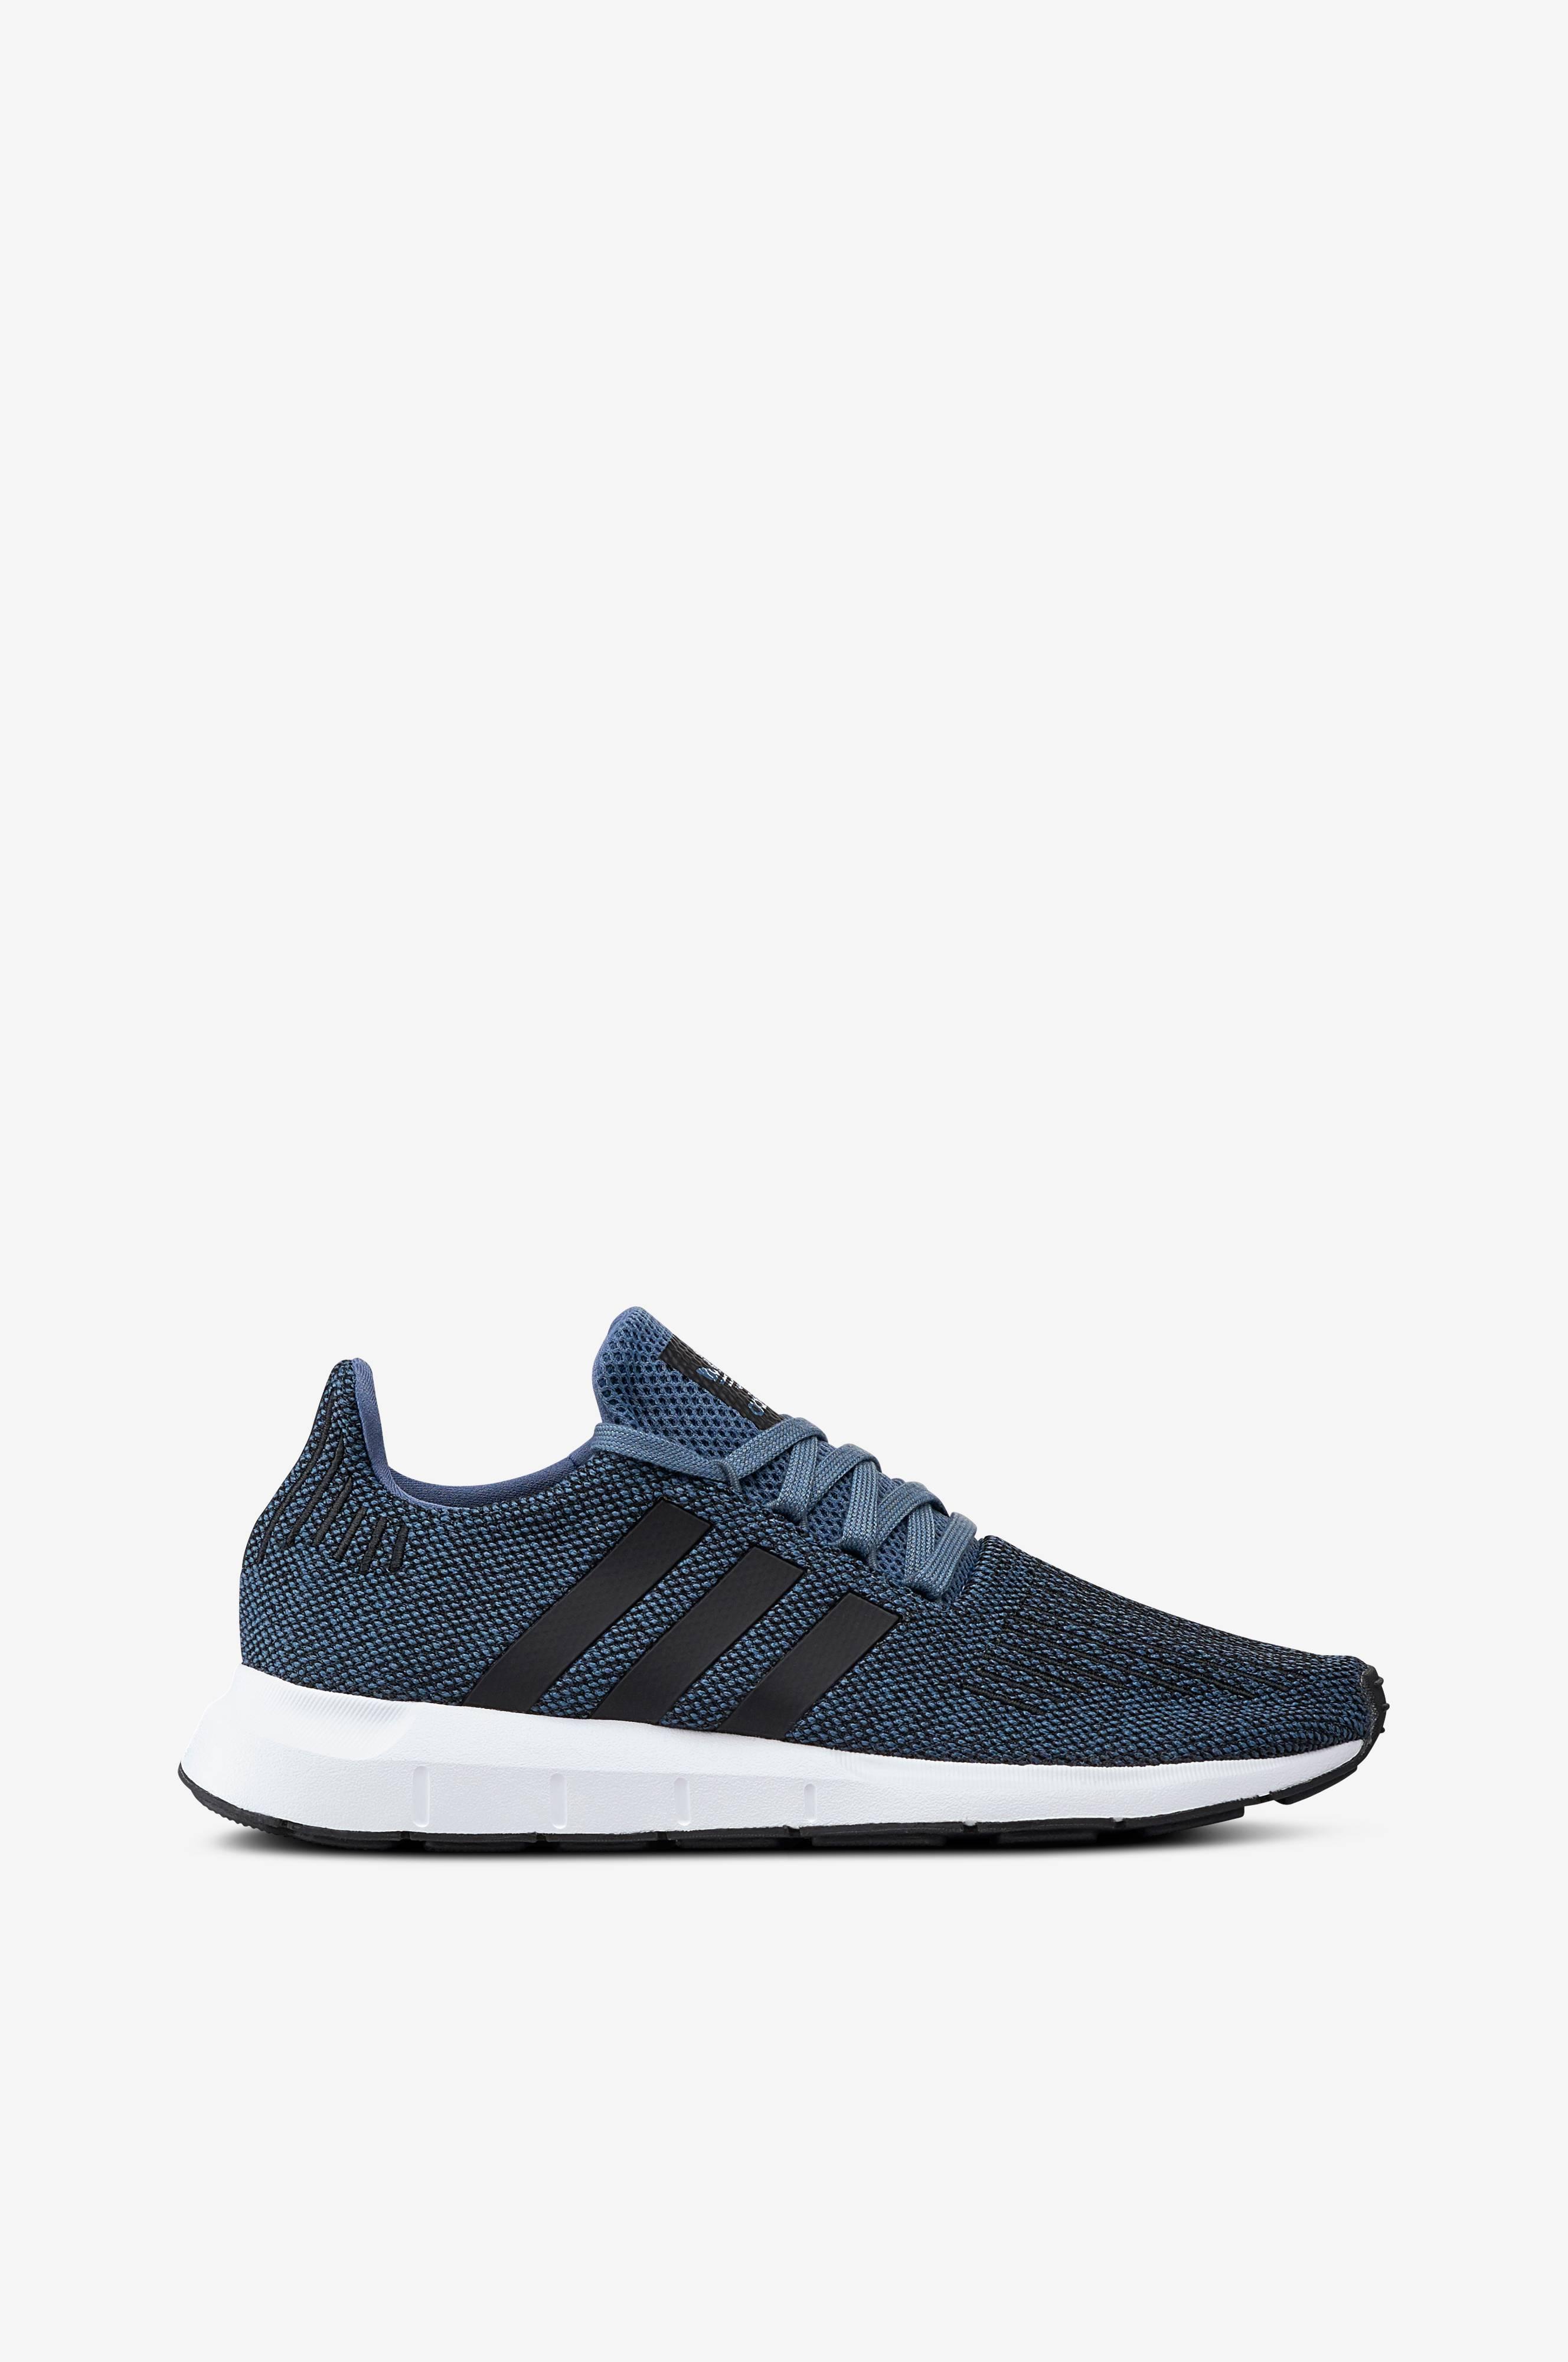 separation shoes 6f329 d13aa adidas Originals Sneakers Swift Run M - Grå - Herr - Ellos.se